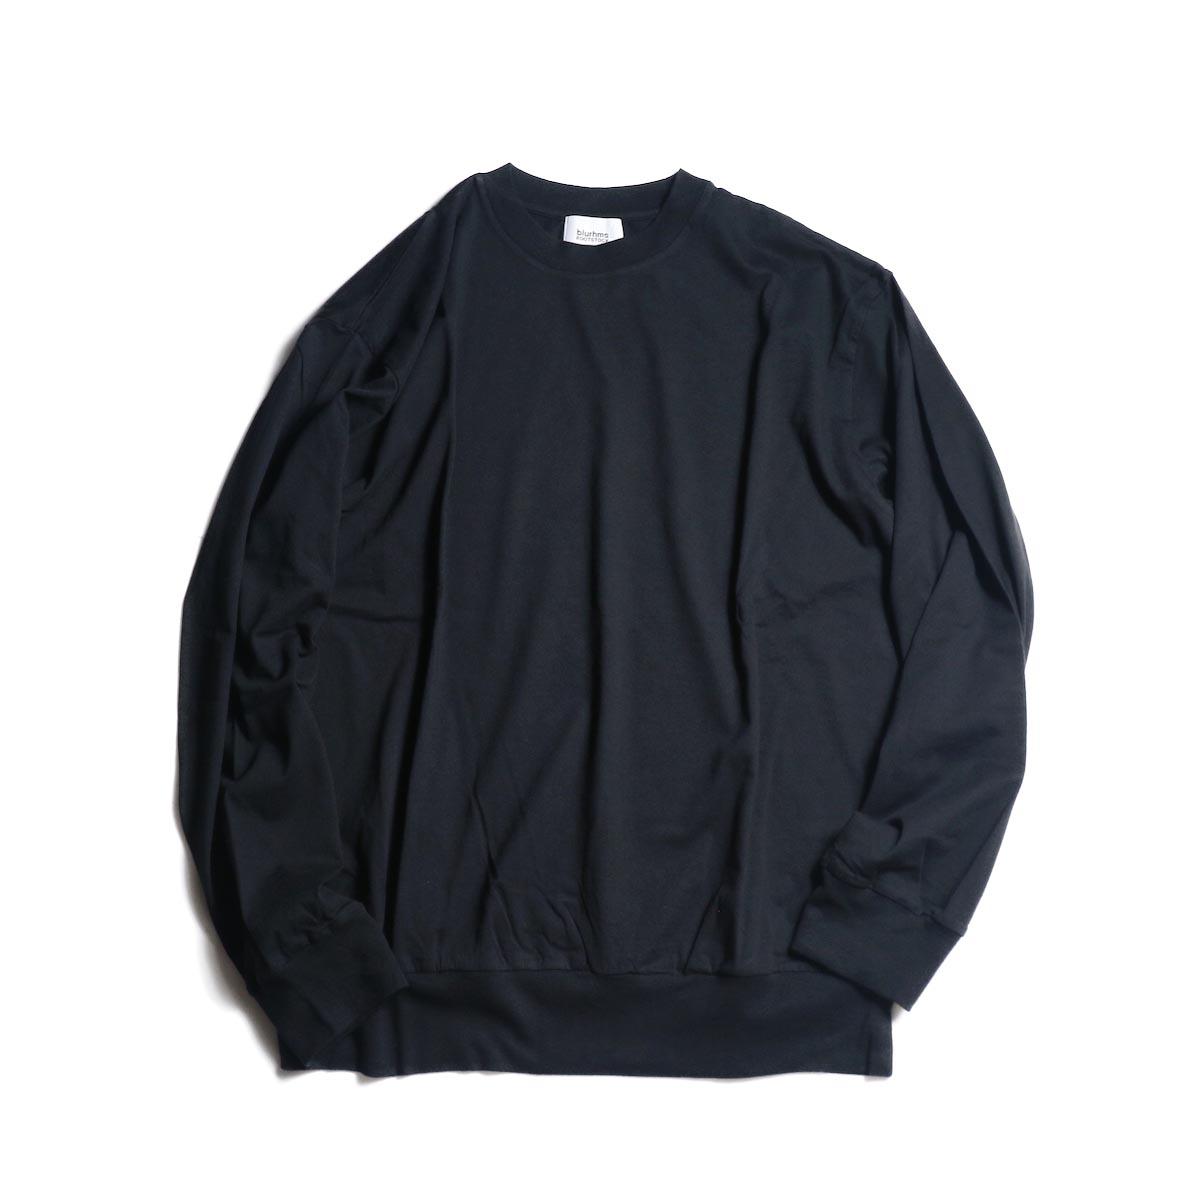 blurhms / Silk Cotton Jersey L/S P/O Loose Fit (Black)